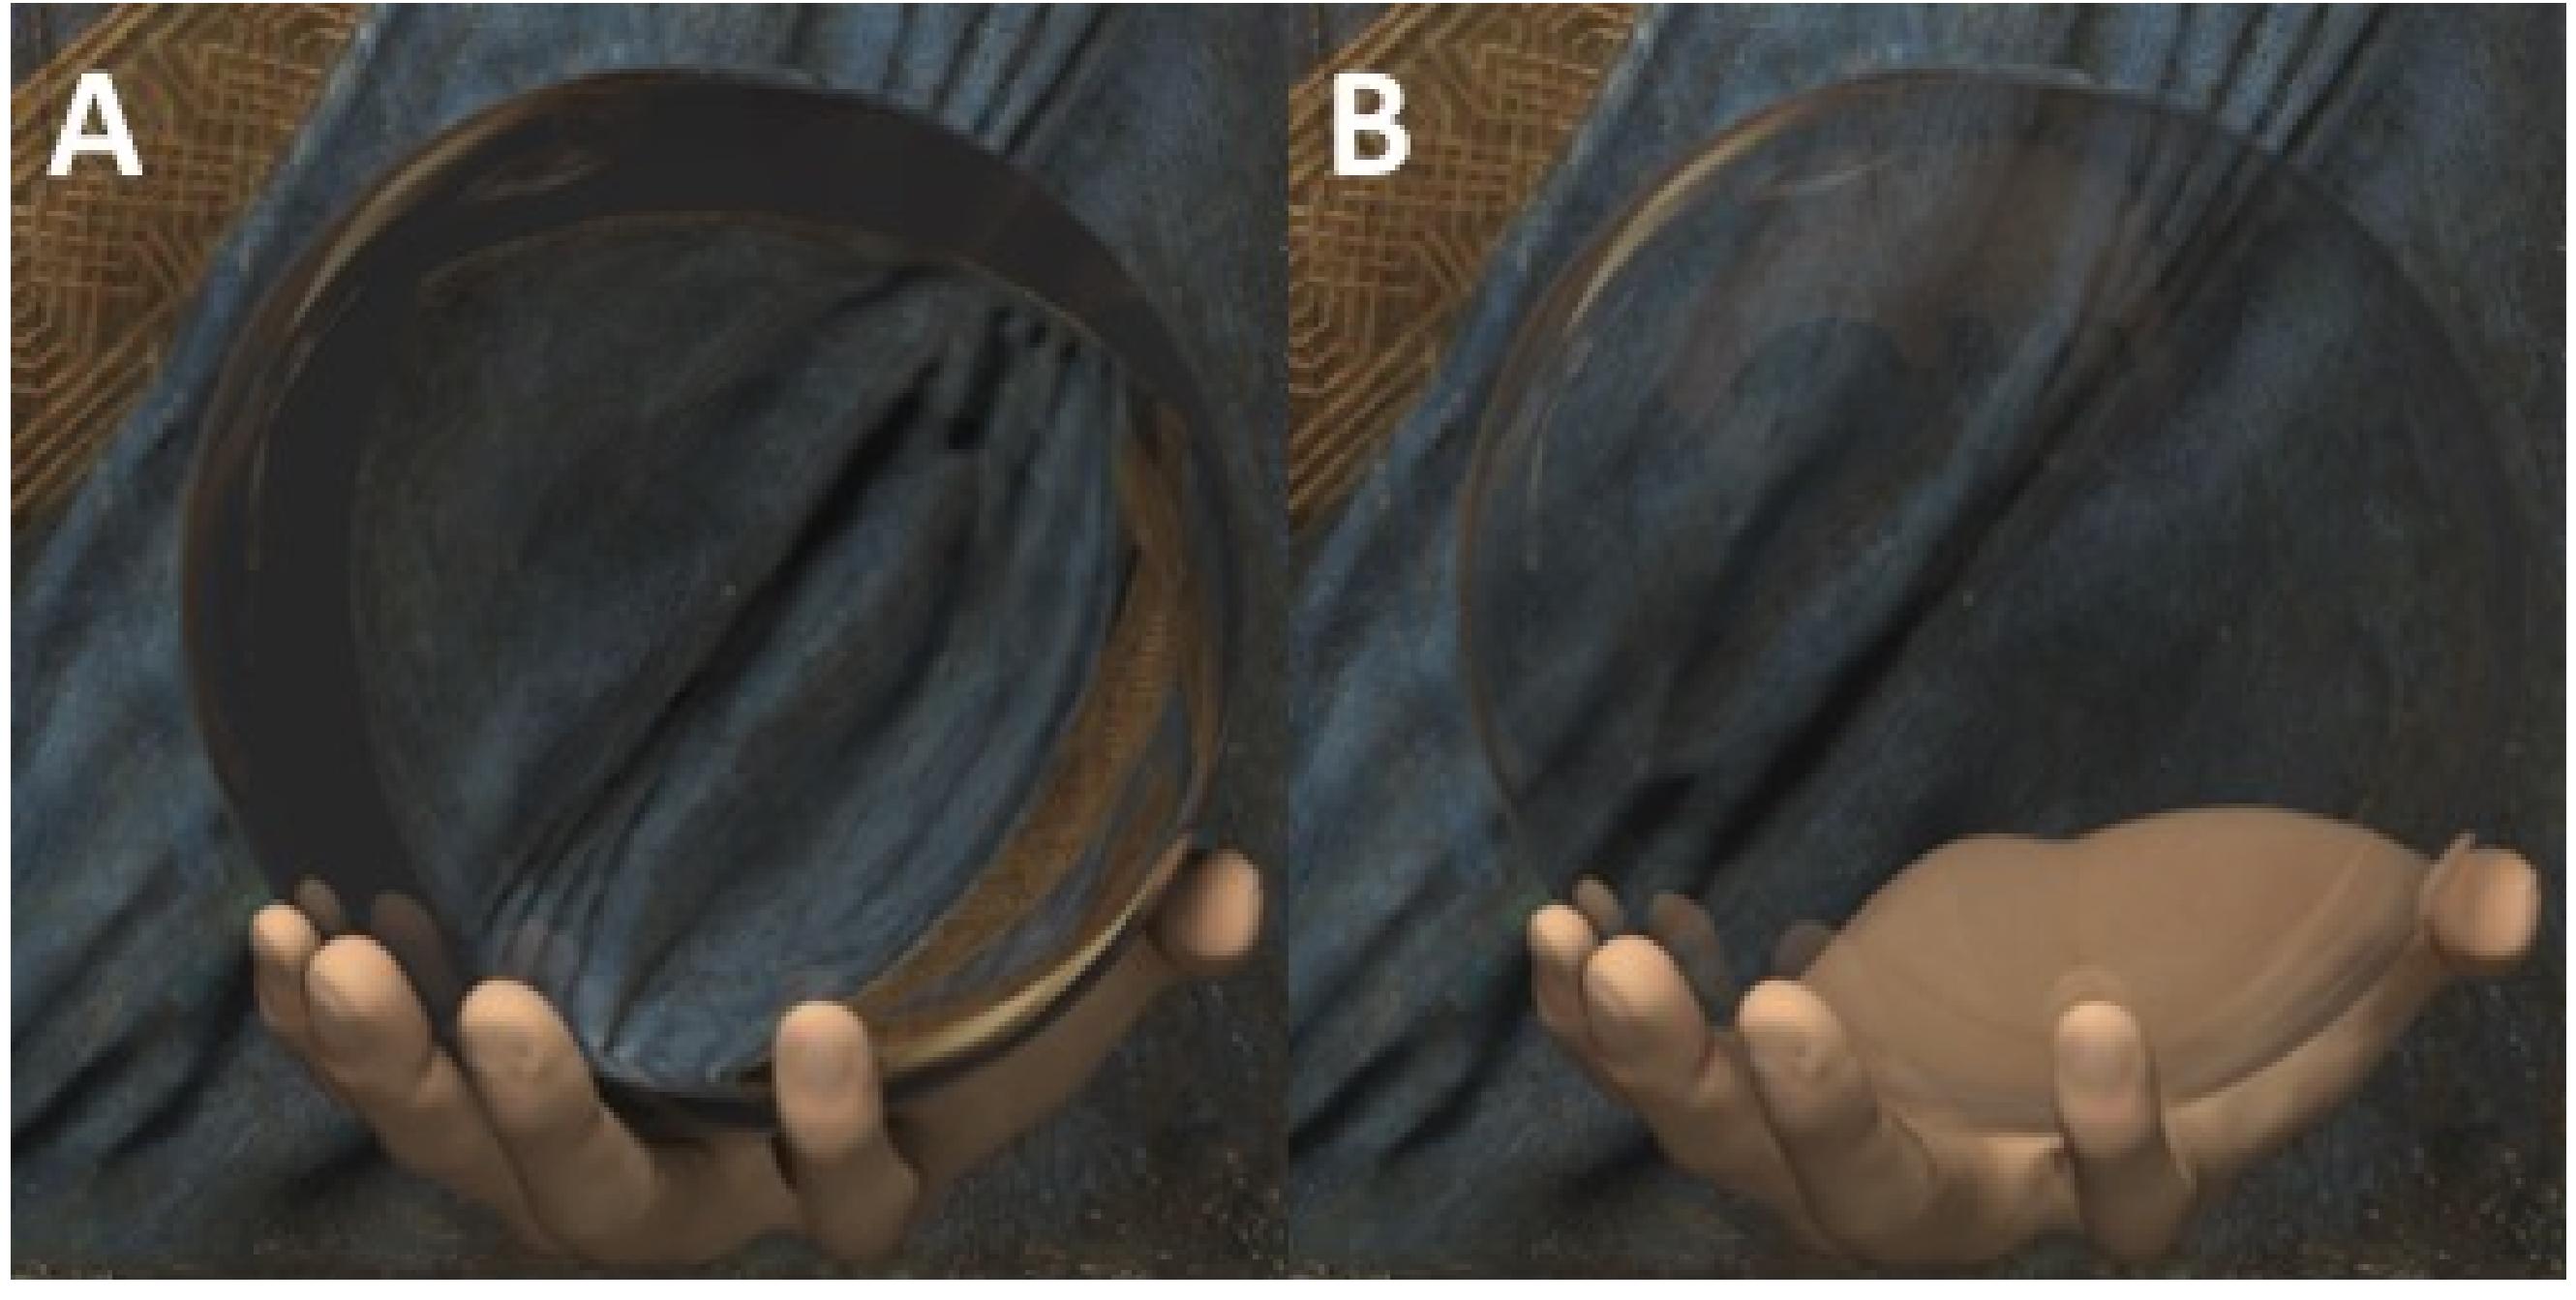 A virtual version of da Vinci's mystery glass orb has helped explain its weirdness